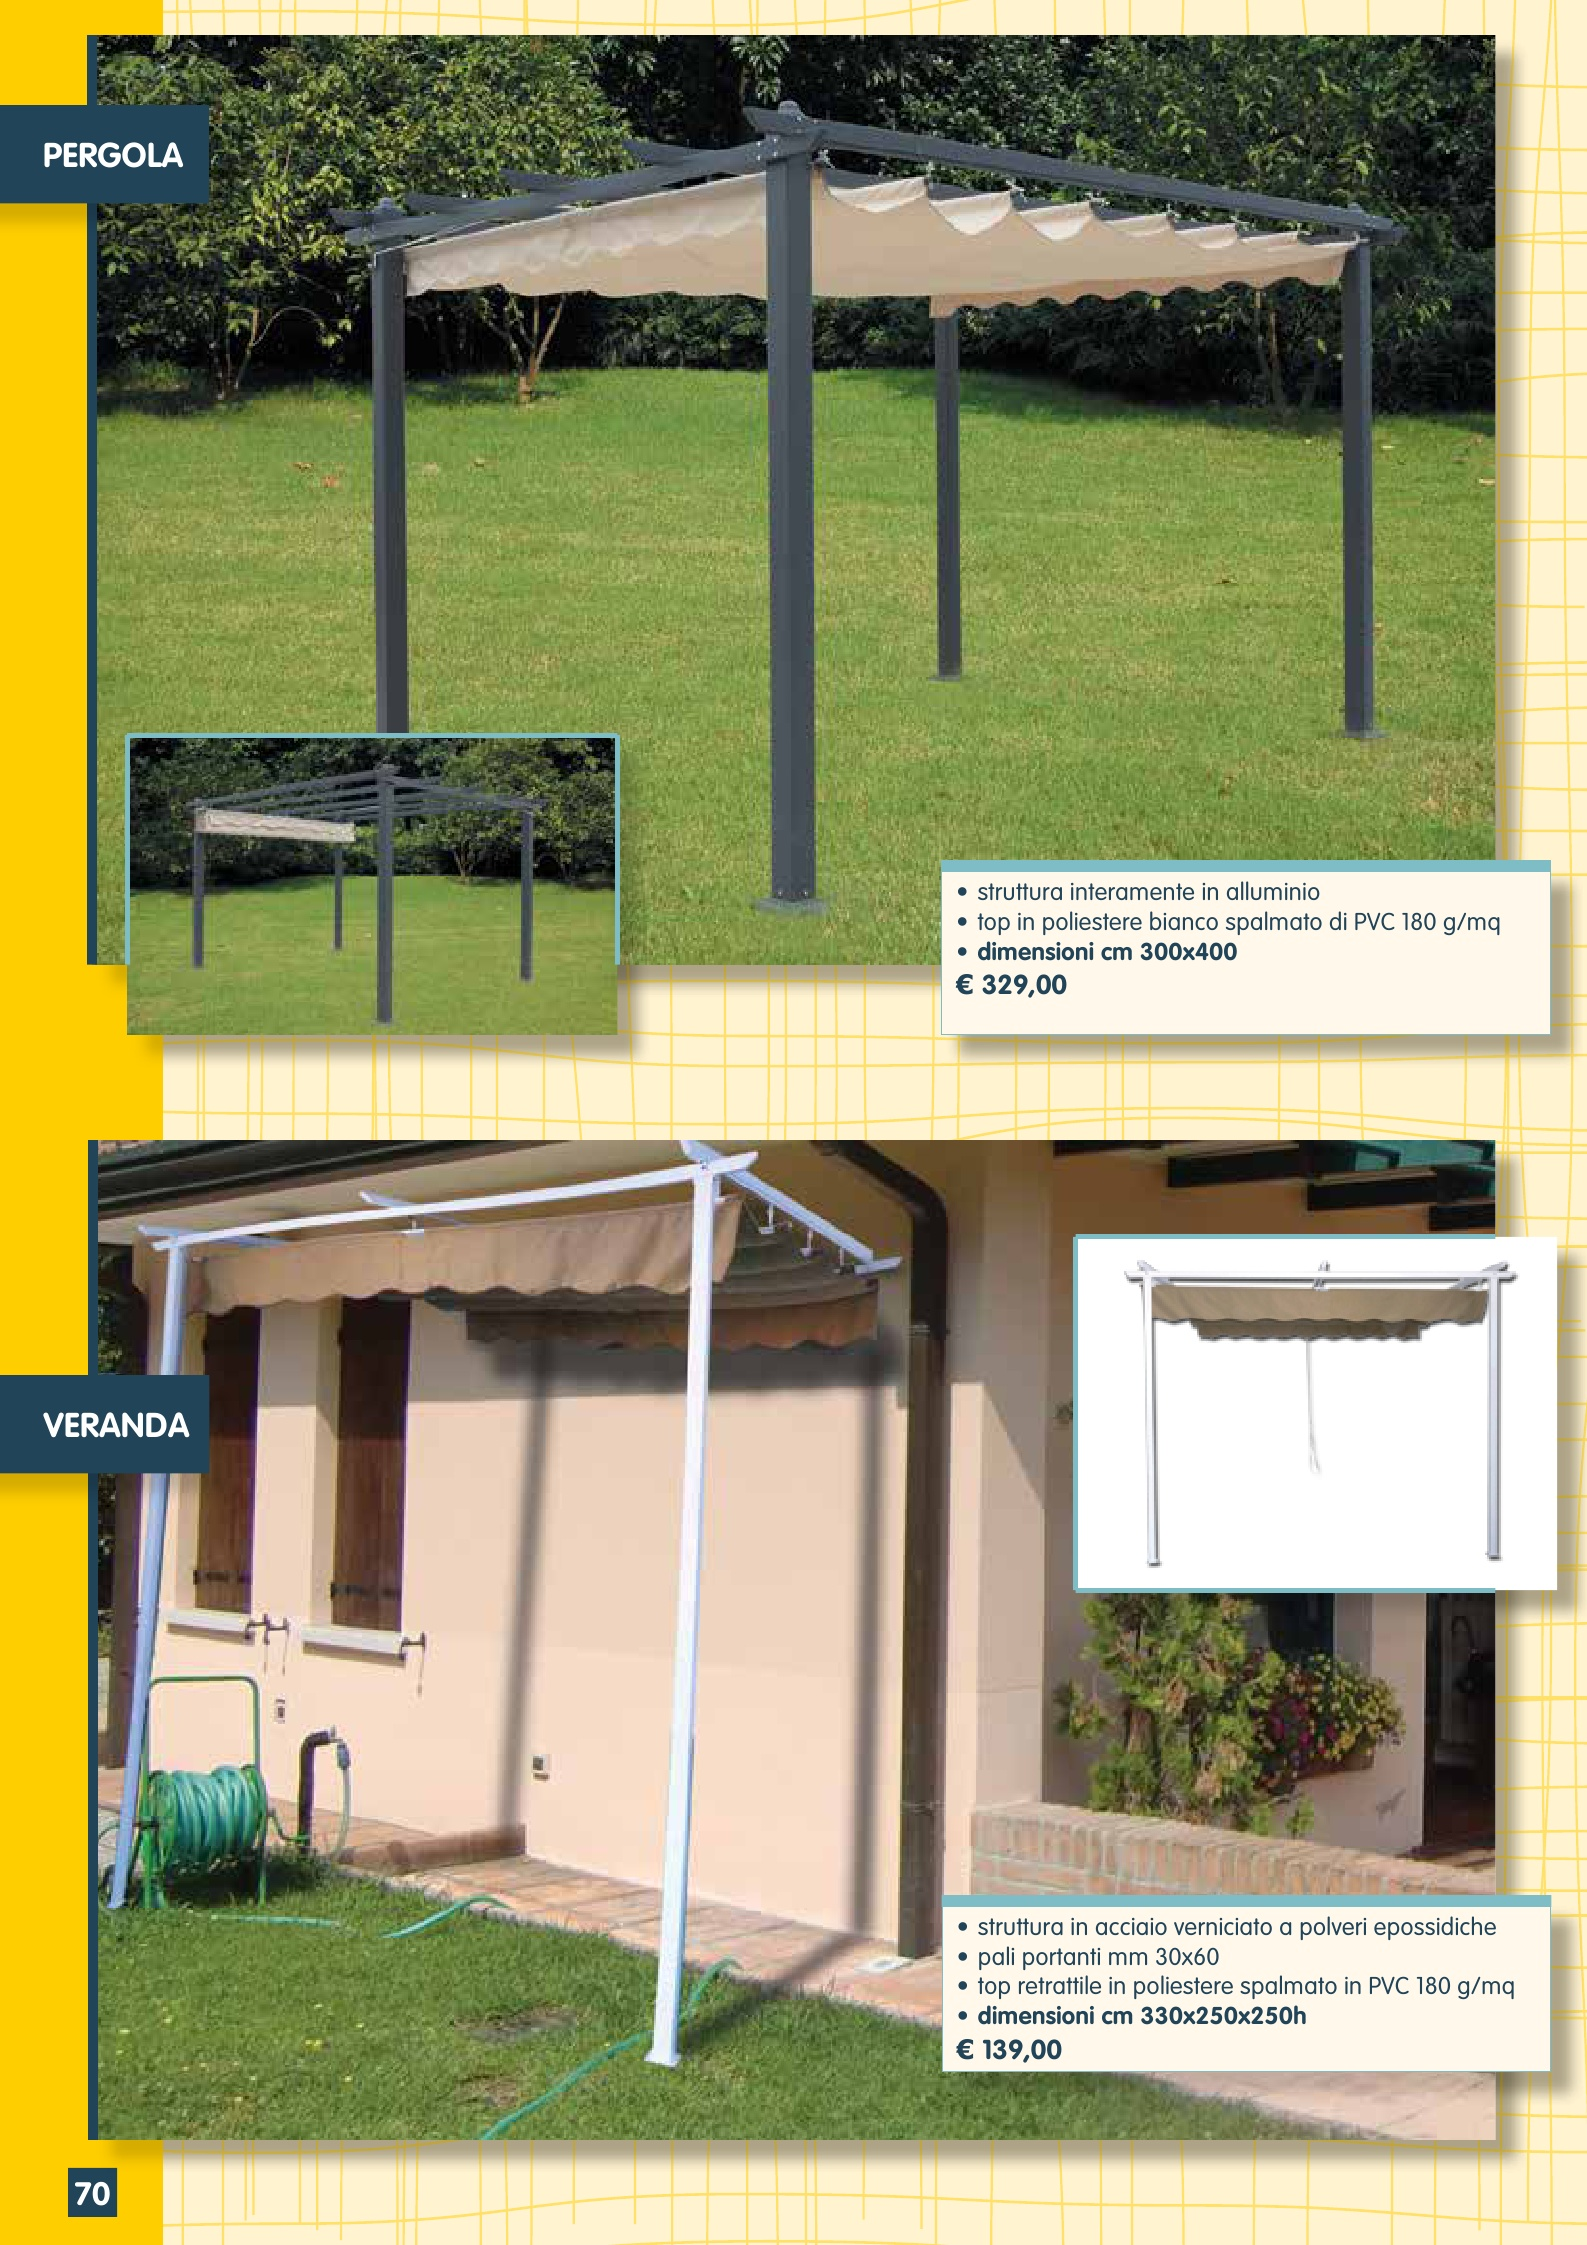 Arredi esclusivi per giardini balconi terrazzi windotherm - Arredi per giardini e terrazzi ...